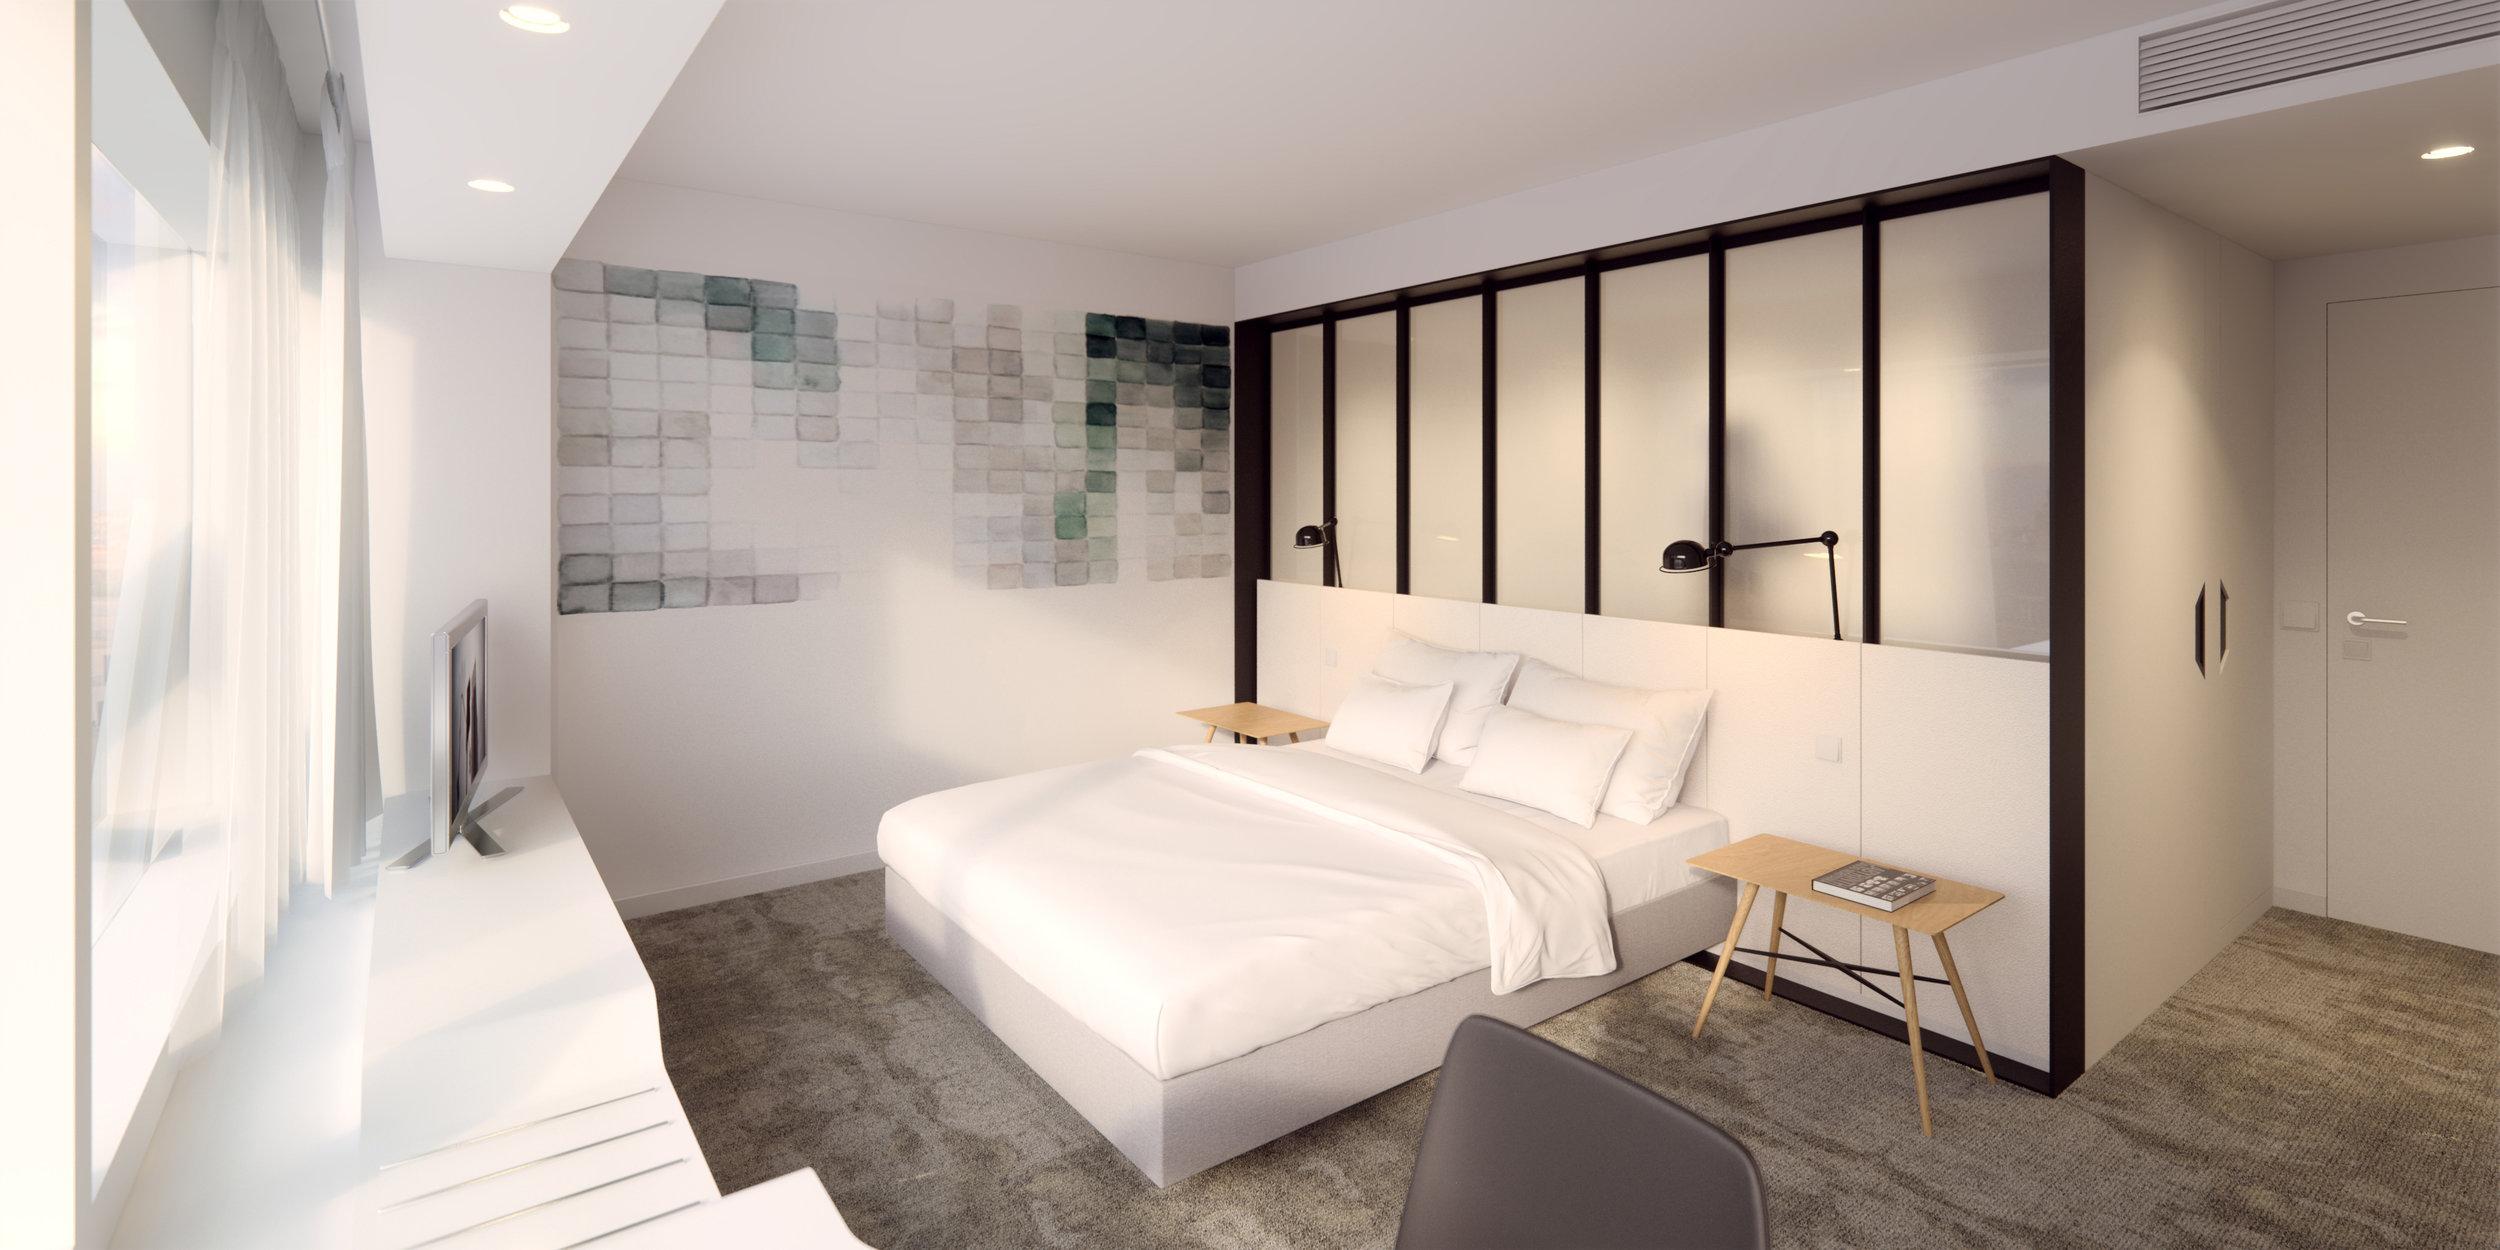 CarmineCrimson-Archviz-2015-hotelparislyon-ch-std.jpg